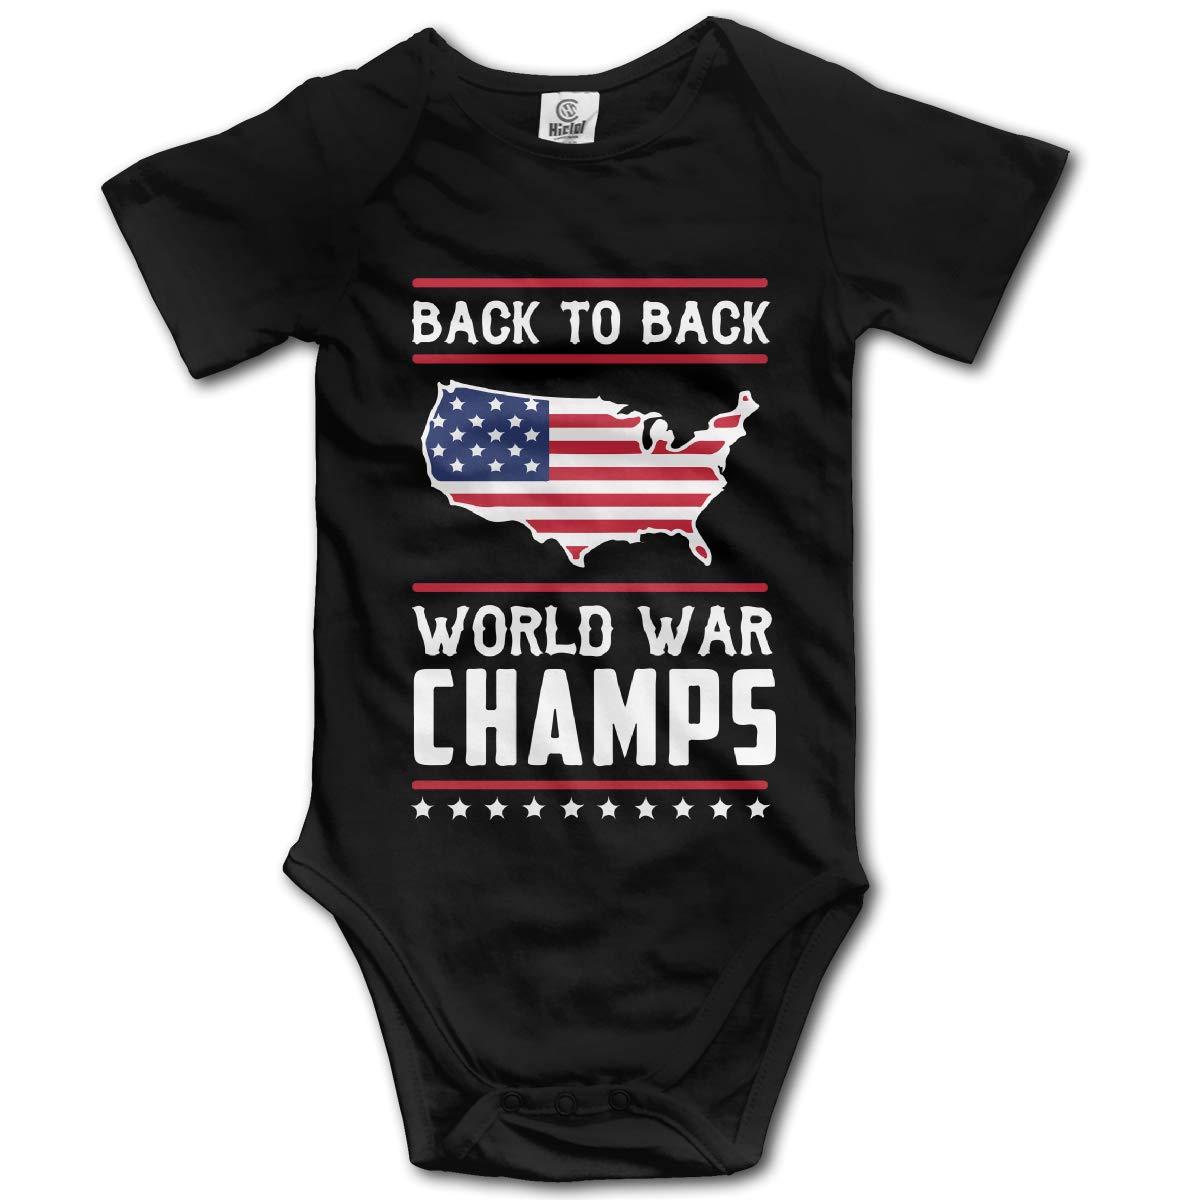 Back-to-Back World War Champs Baby Unisex Short Sleeve Romper Bodysuit Tops 0-24M